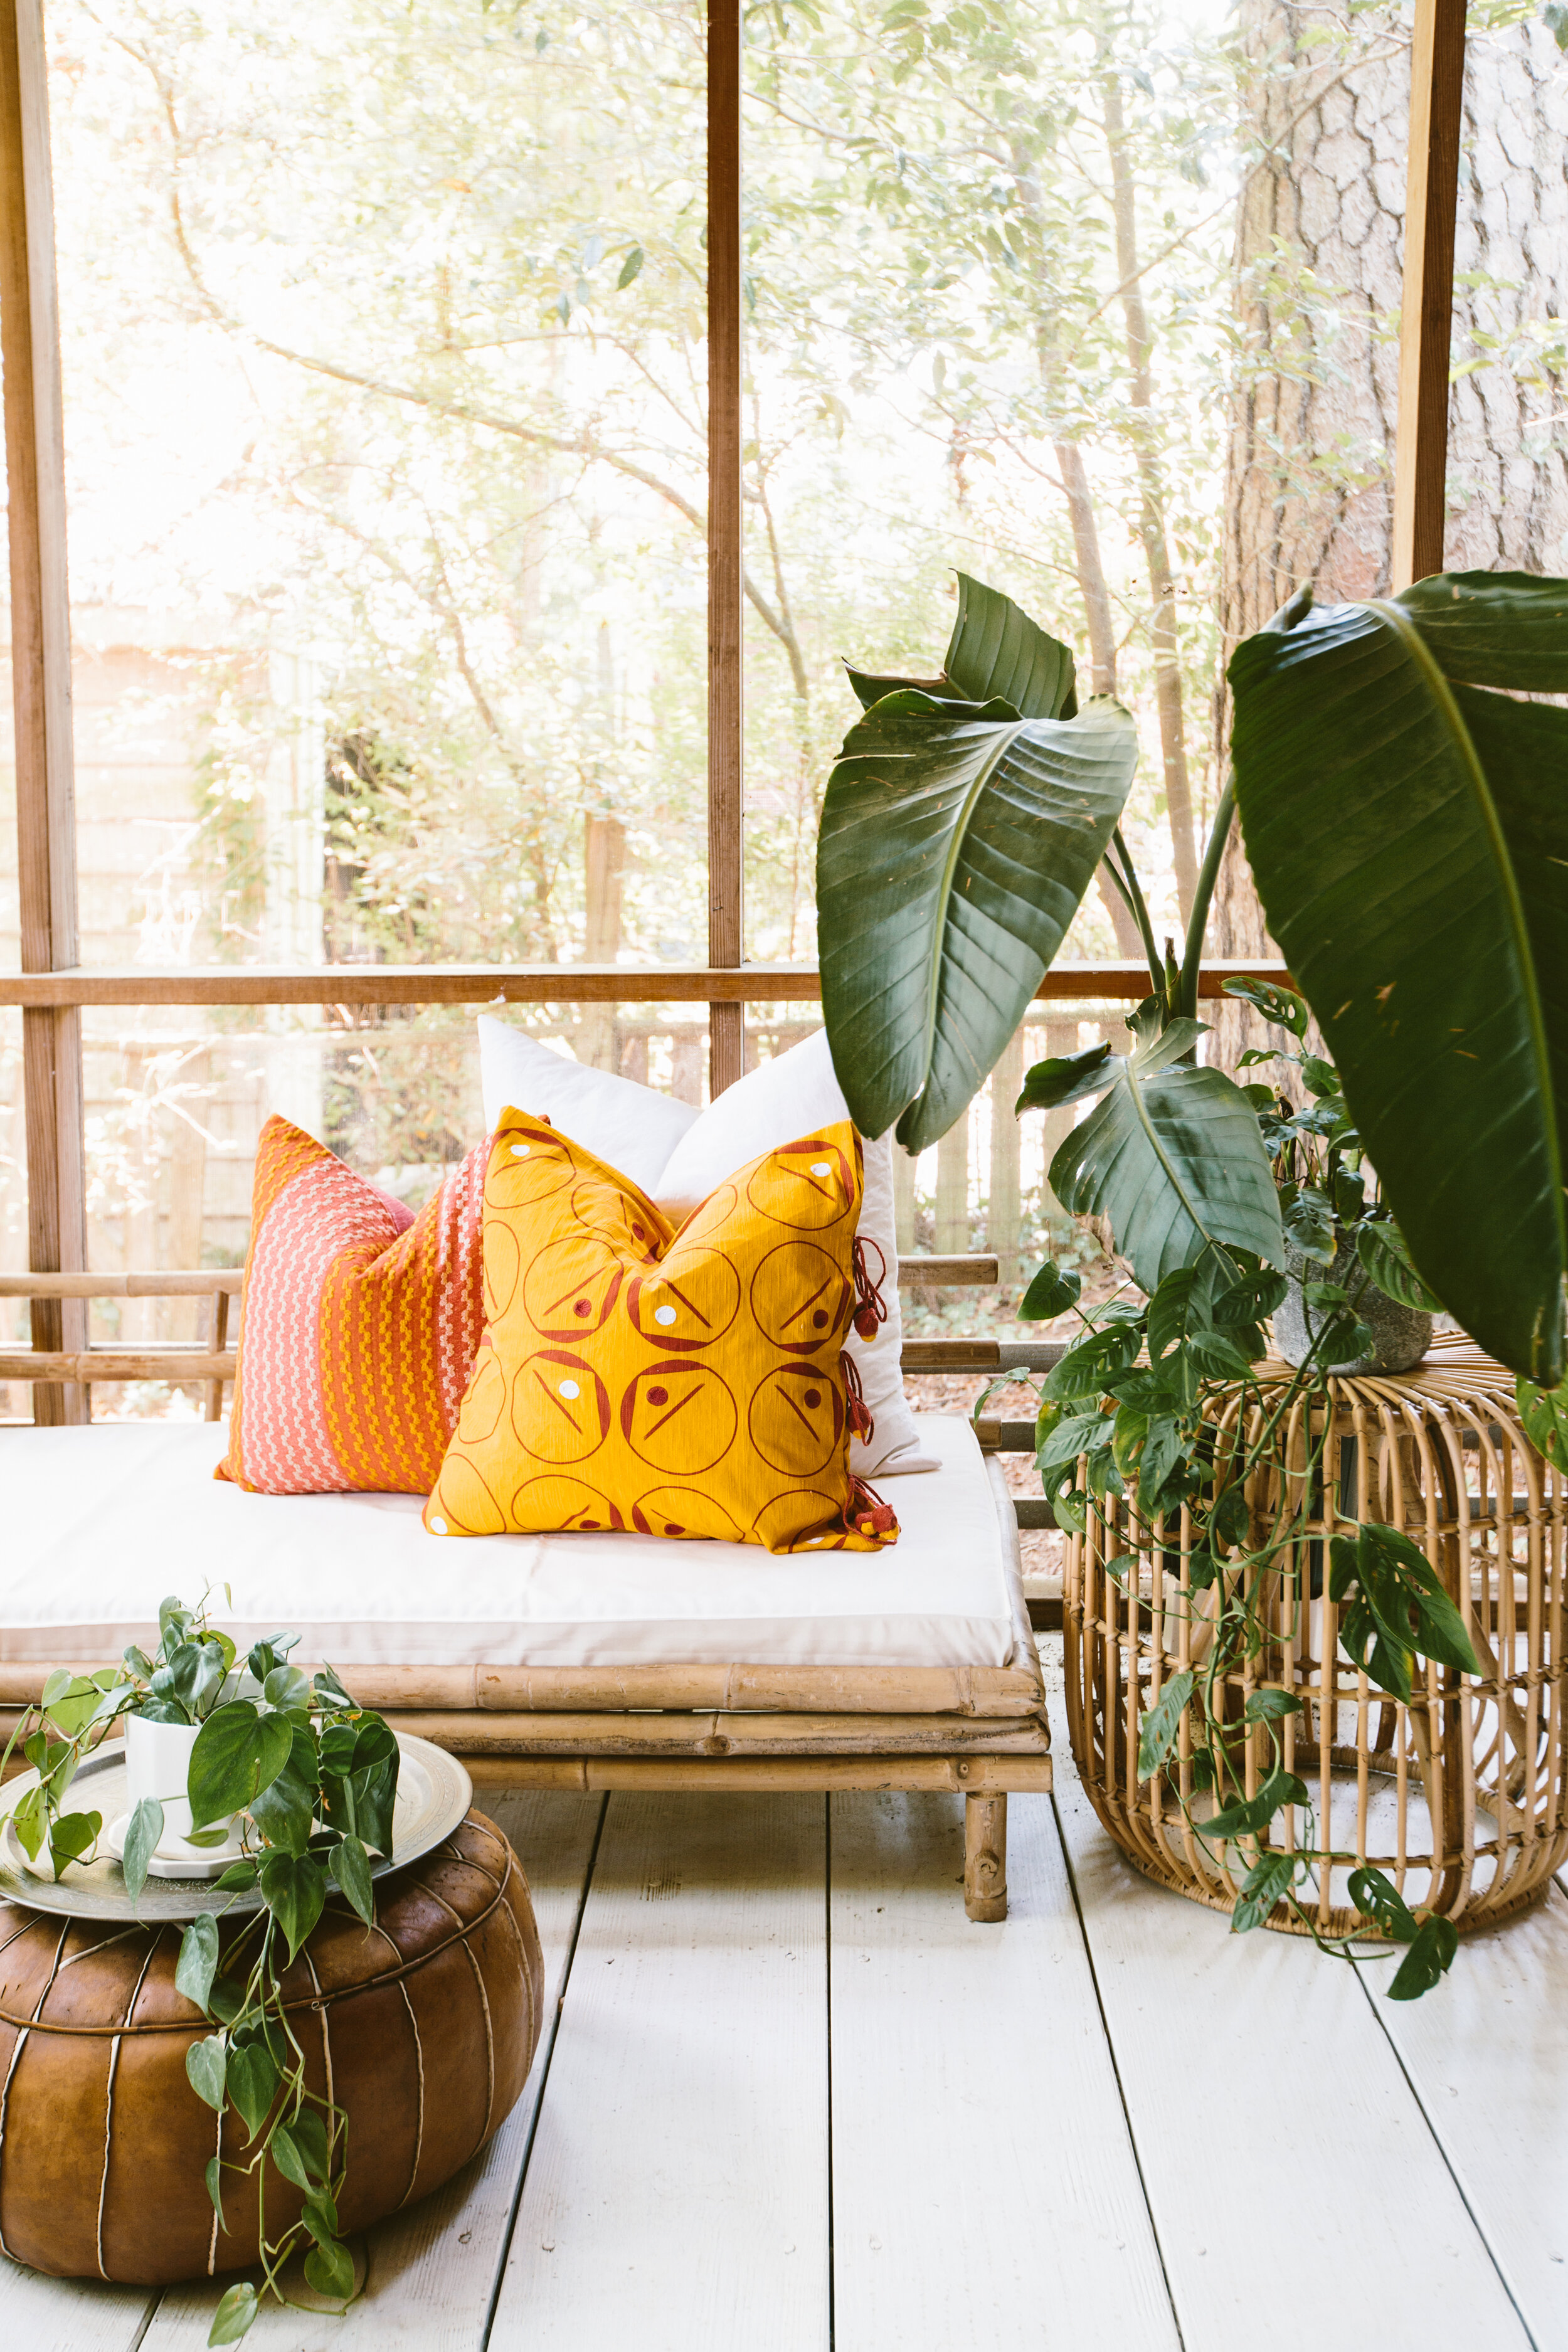 ChandanWhittle_Bindi-Cushions_PhotoCredit-Carley Summers.jpg